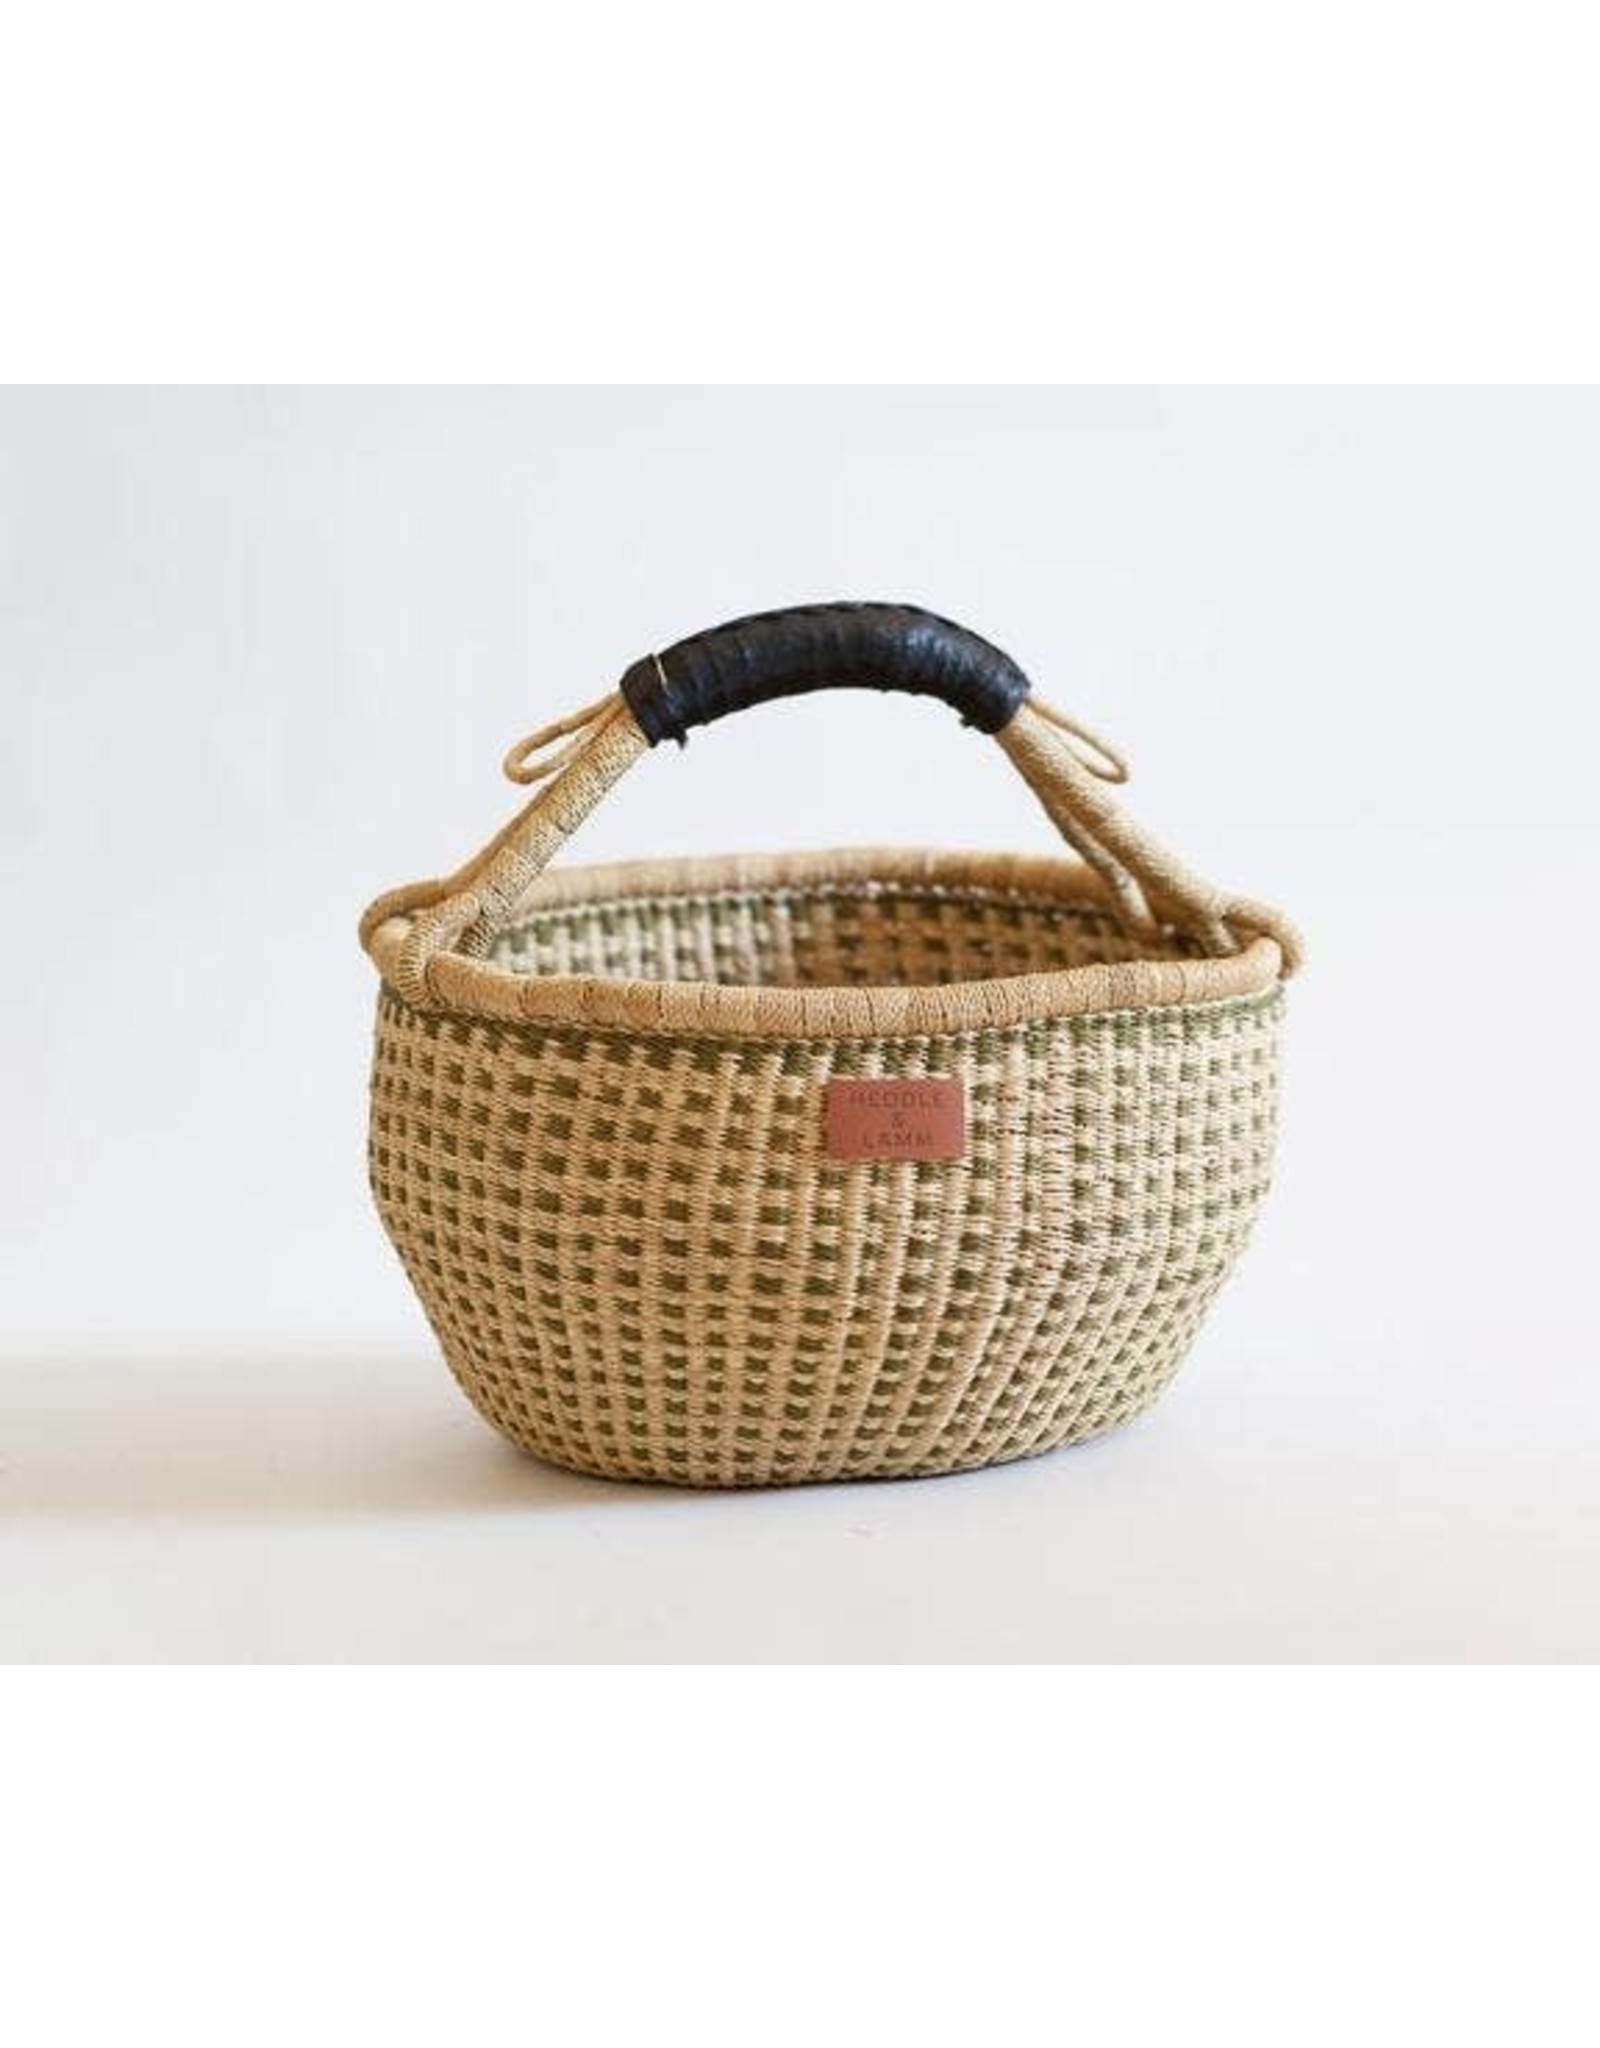 Heddle & Lamm Bolga Basket - Black Leather Handle